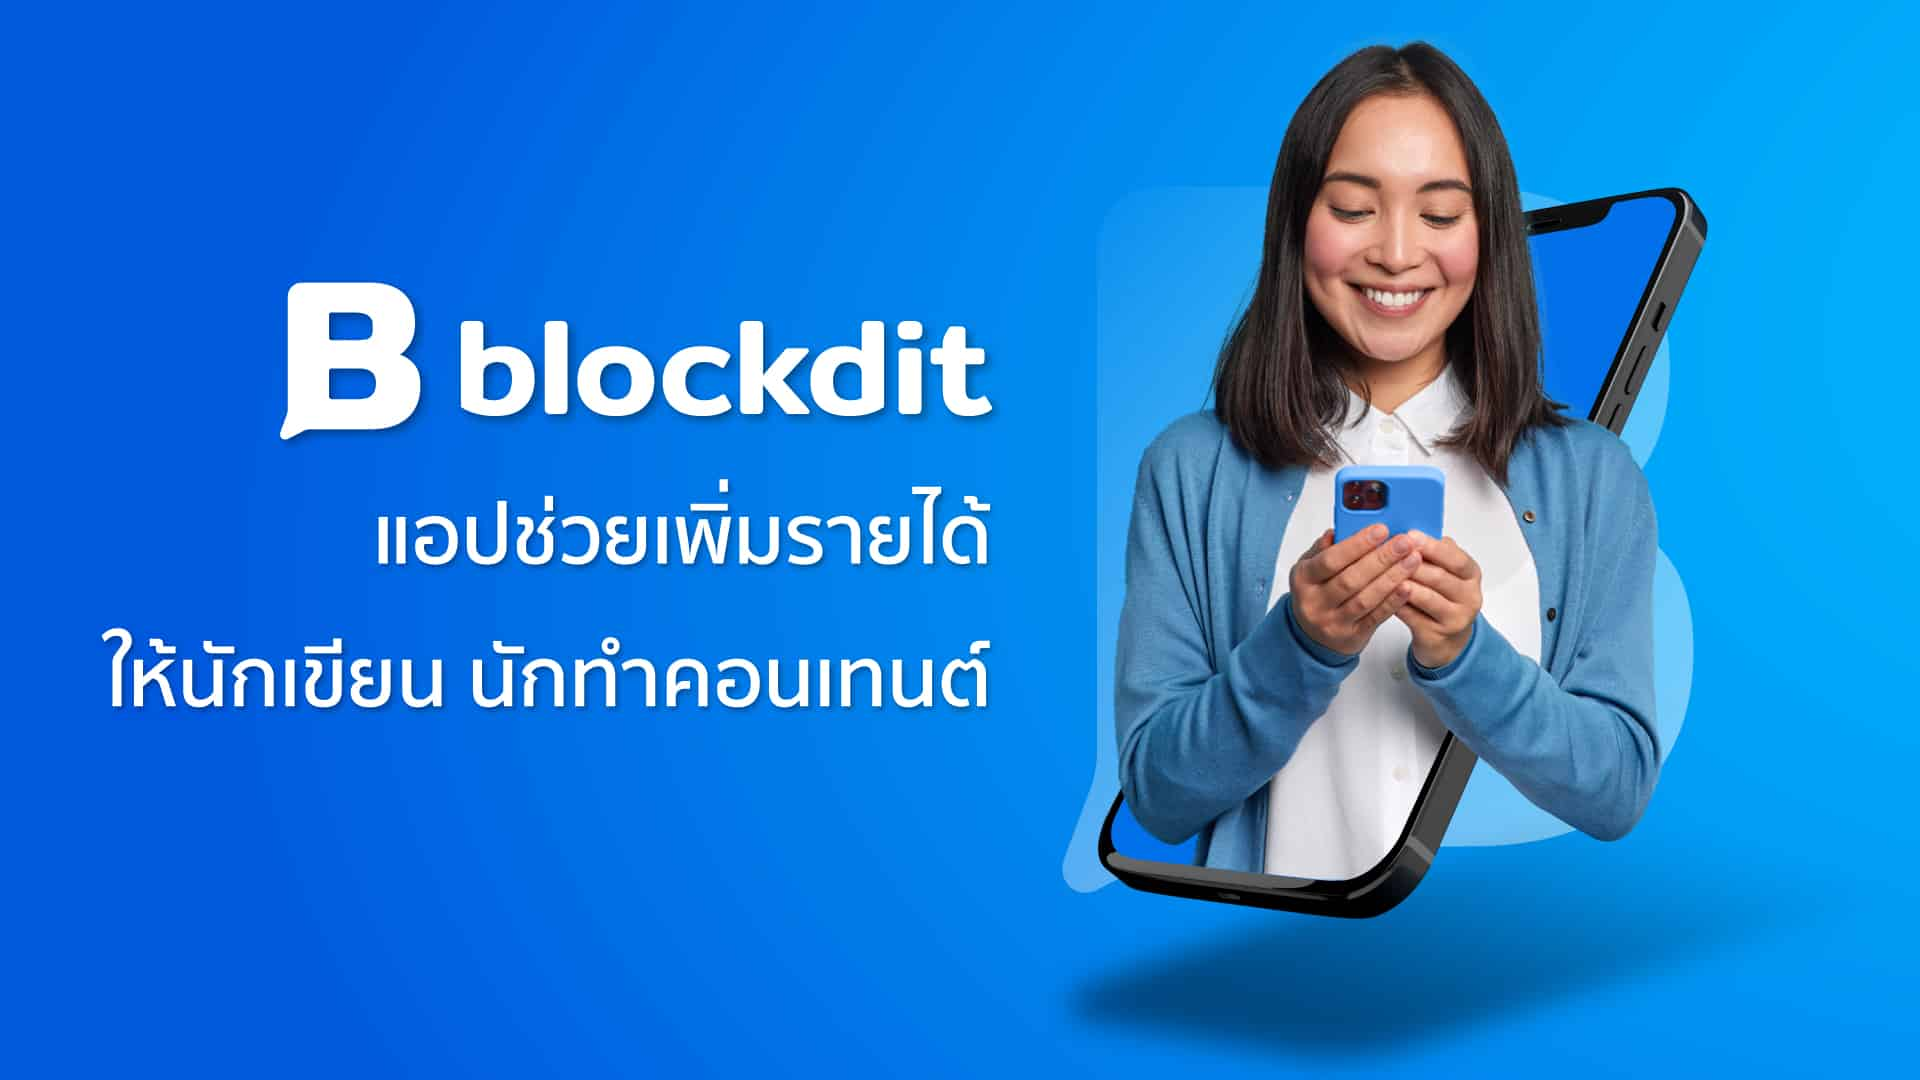 Blockdit แพลตฟอร์มที่ช่วยเพิ่มรายได้ ให้นักเขียน นักทำคอนเทนต์ ในยุคโควิด